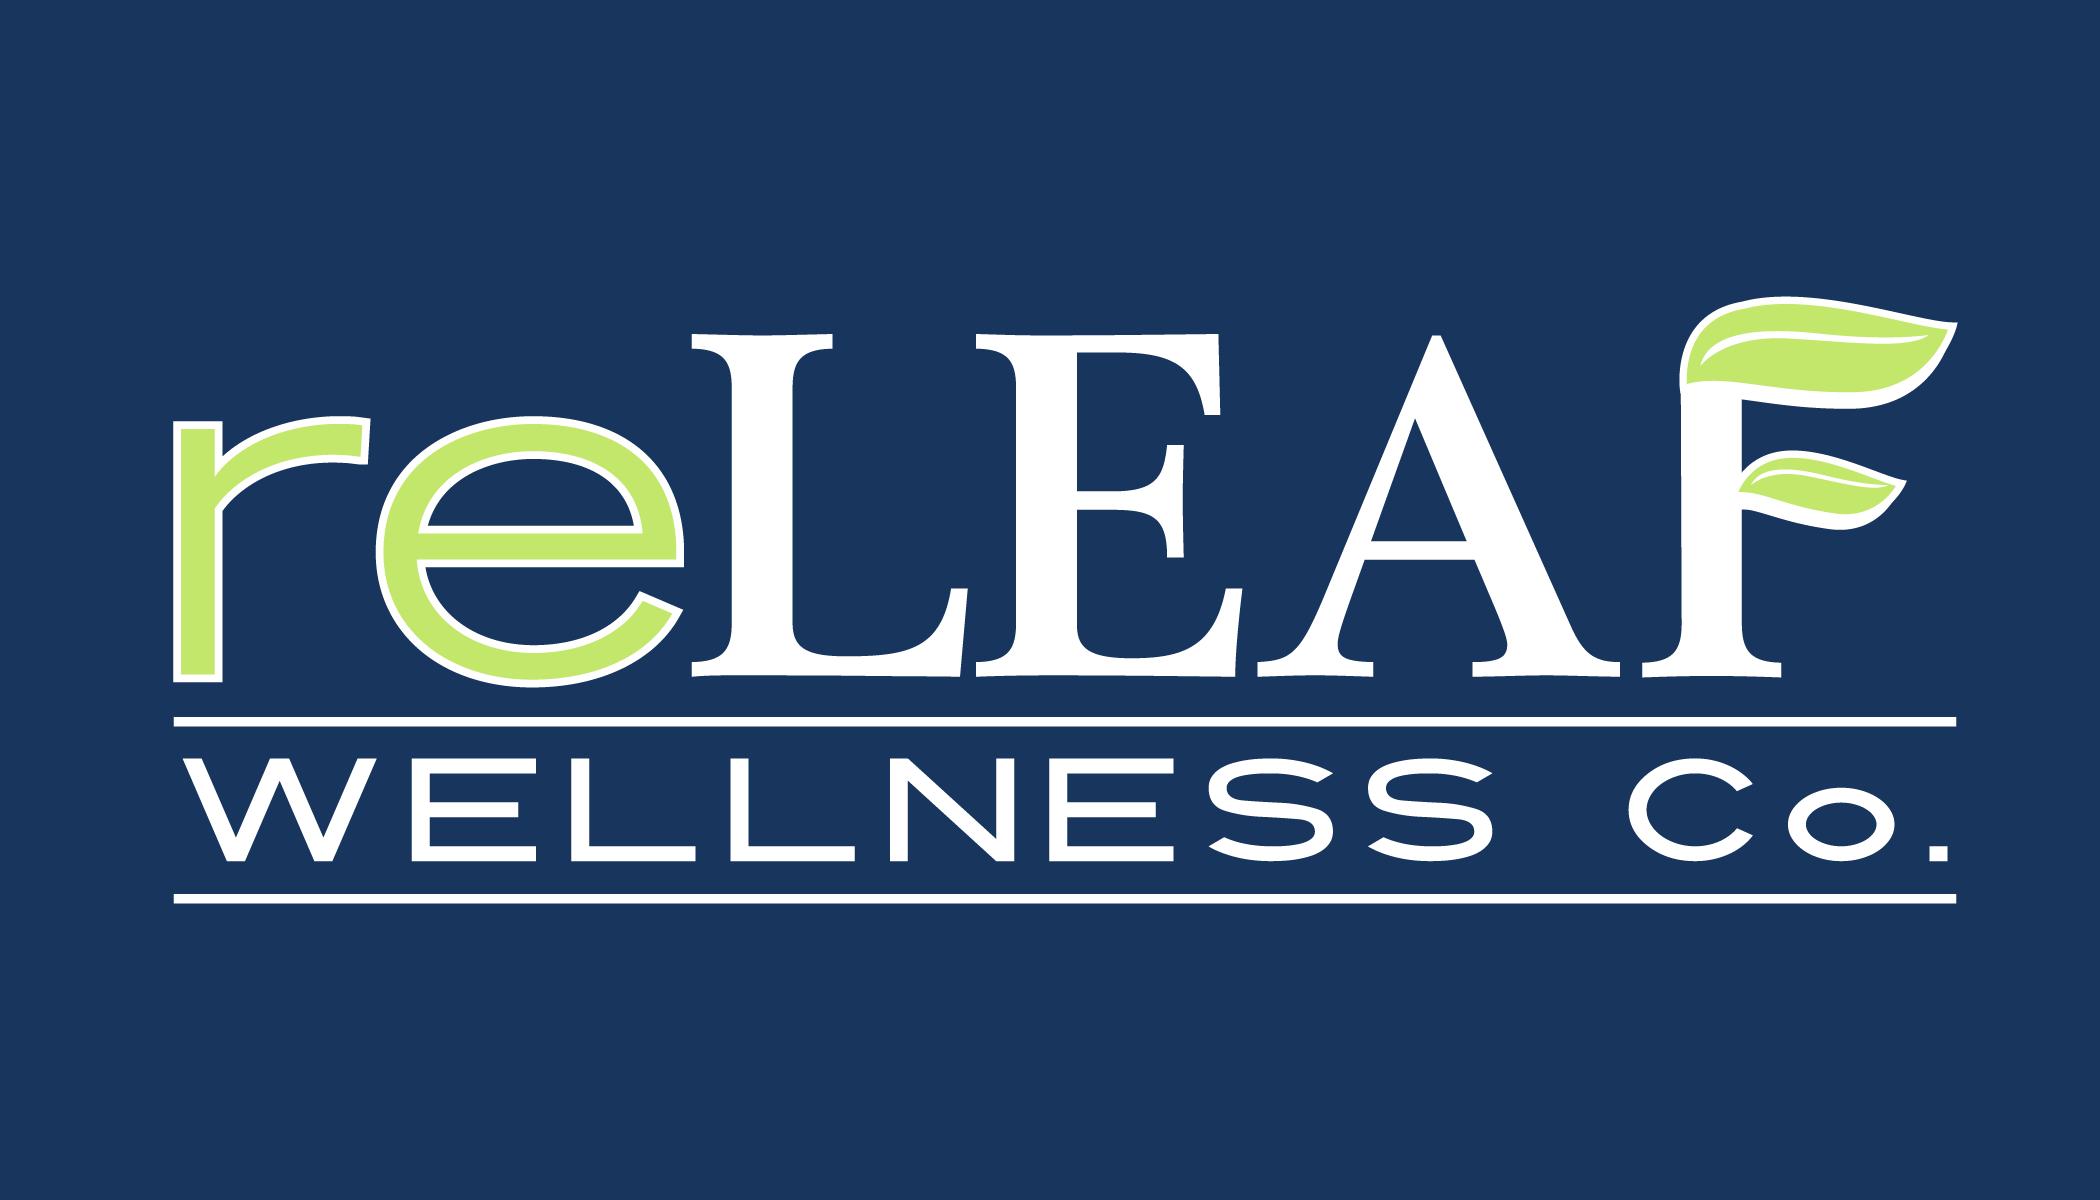 reLEAF Wellness Co.